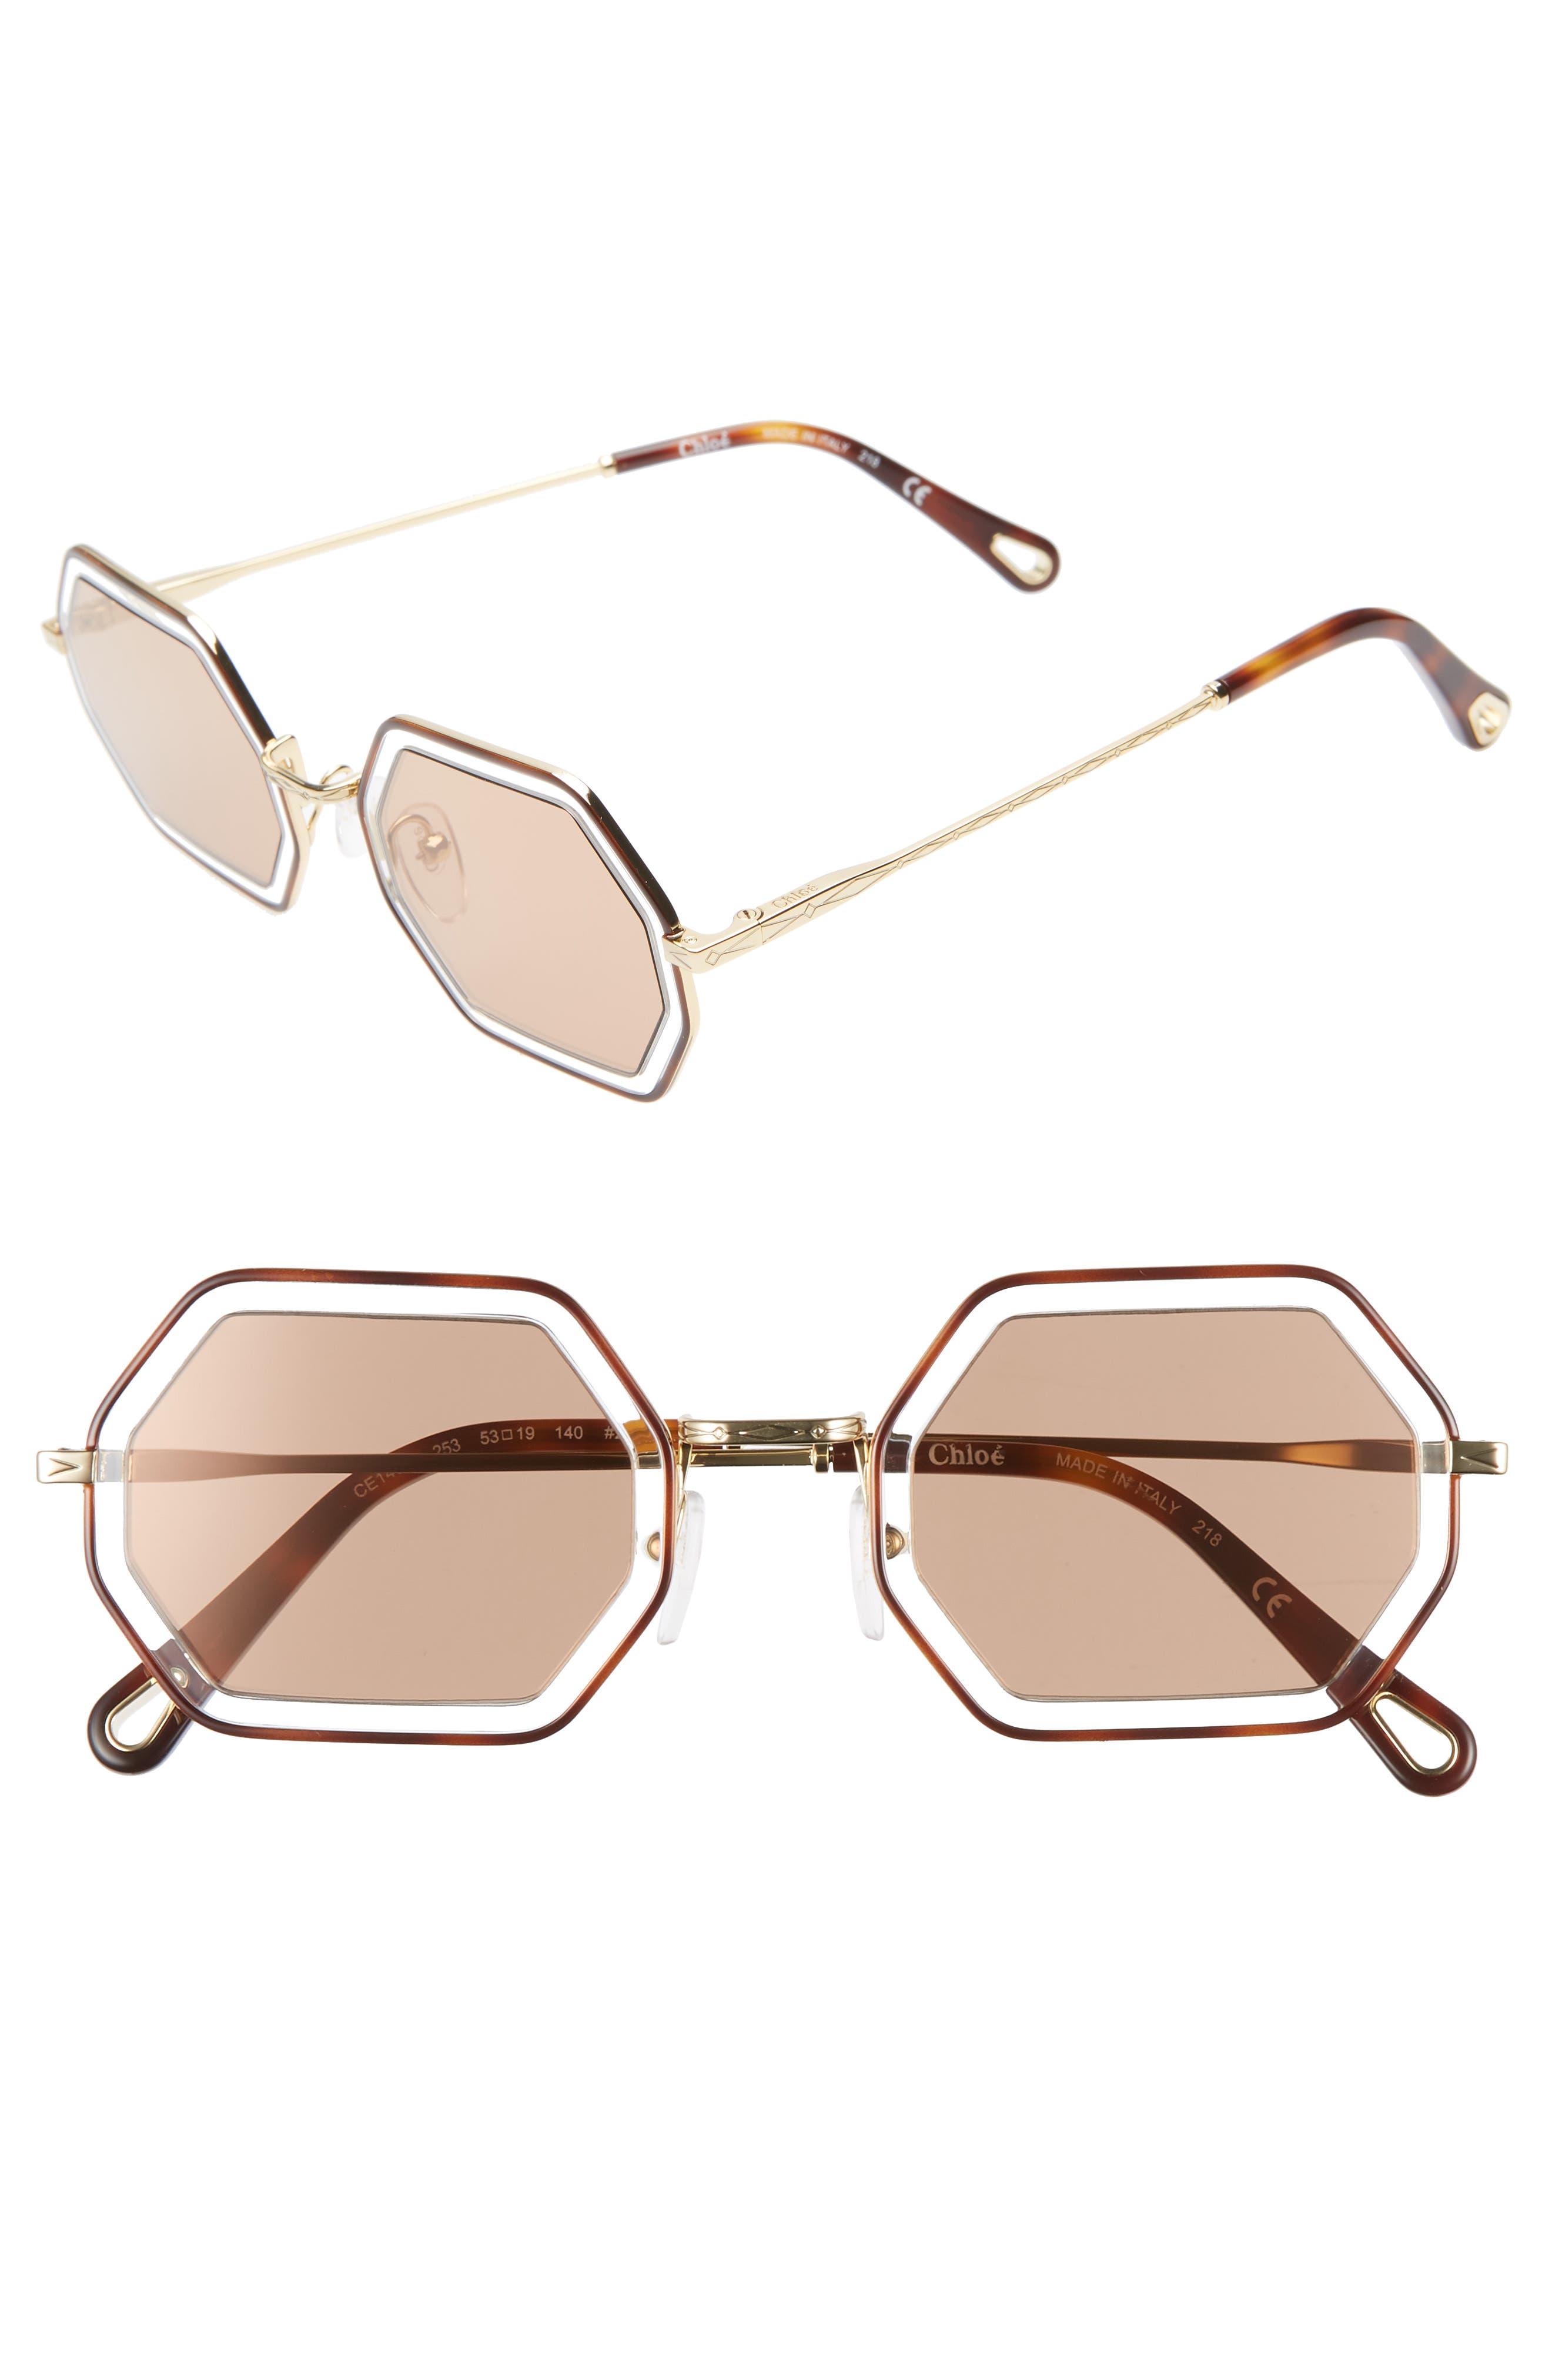 Chloe Tally 5m Octagon Sunglasses - Havana/ Crystal/ Brown Mirror